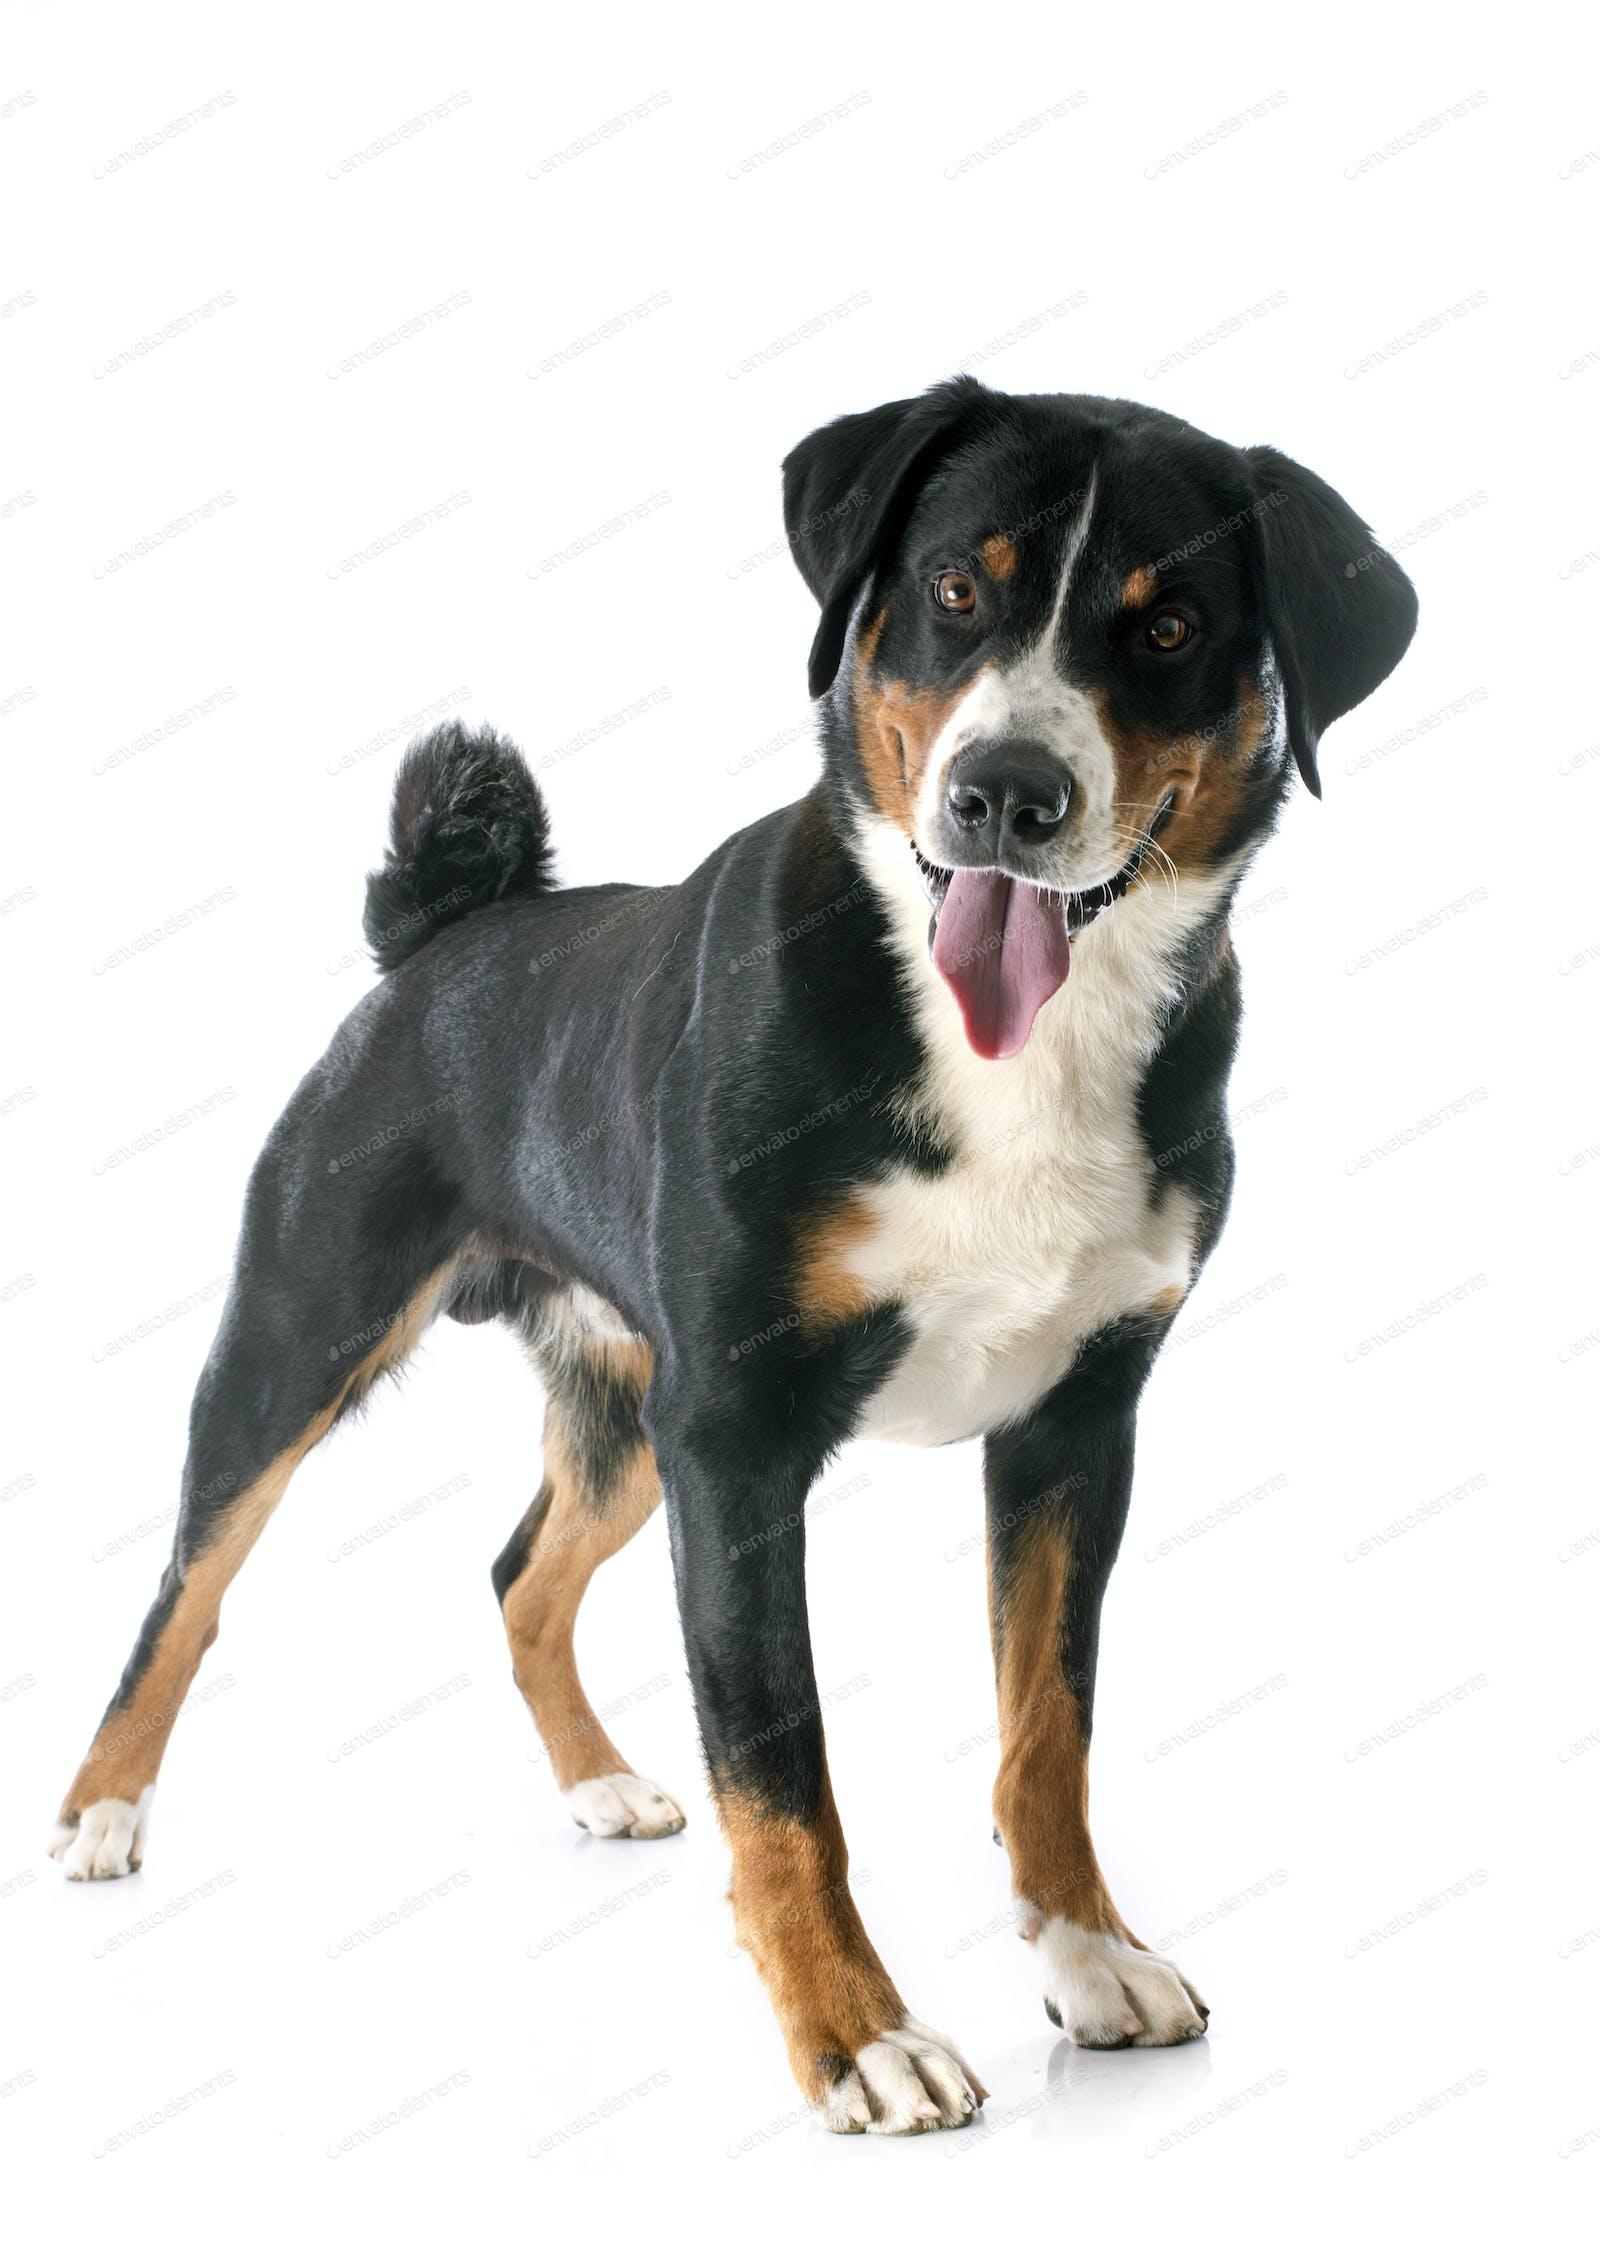 Appenzeller Sennenhund Photo By Cynoclub On Envato Elements